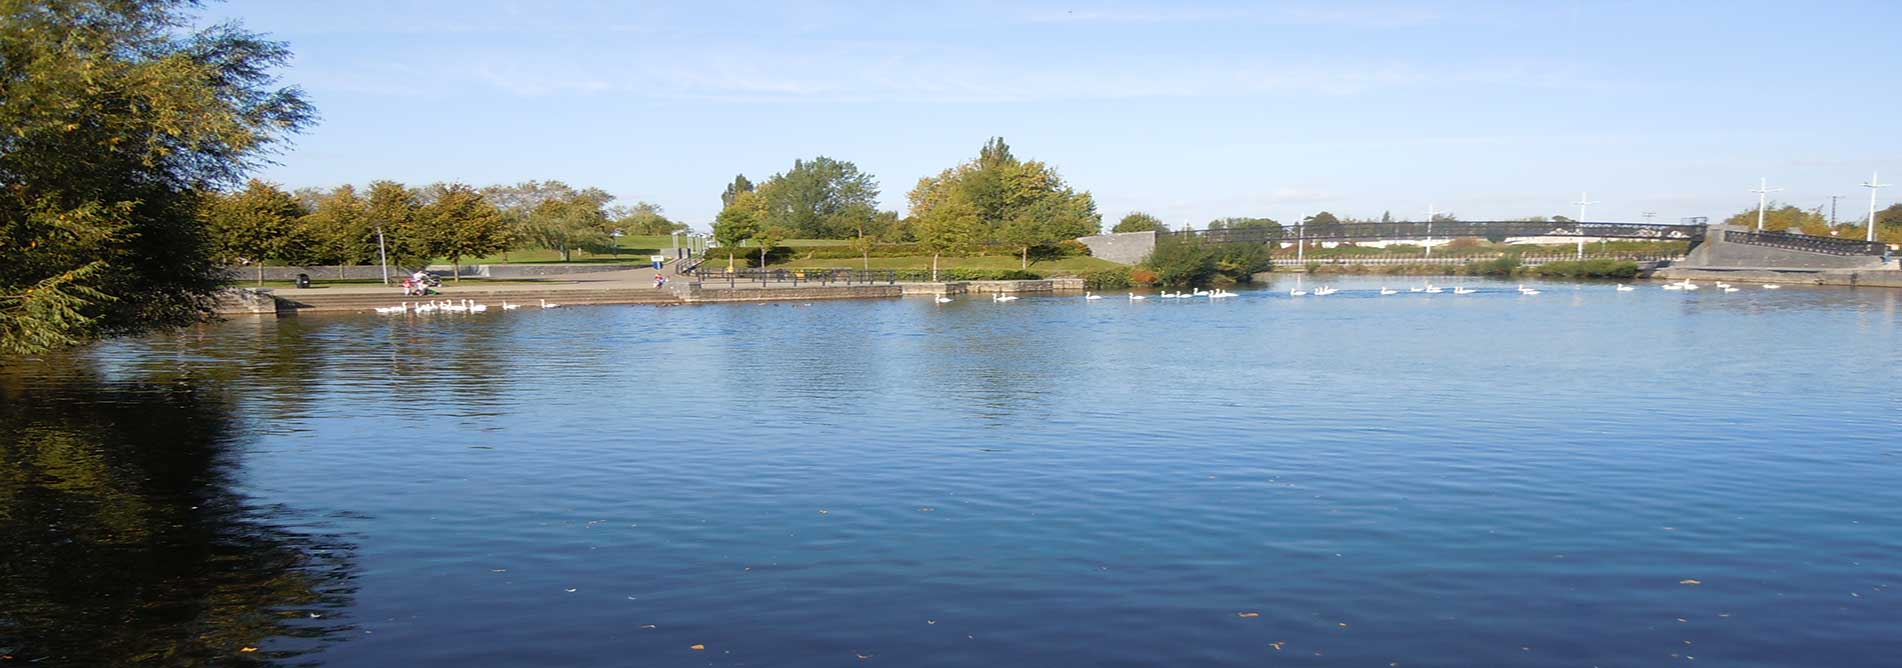 carlow lake